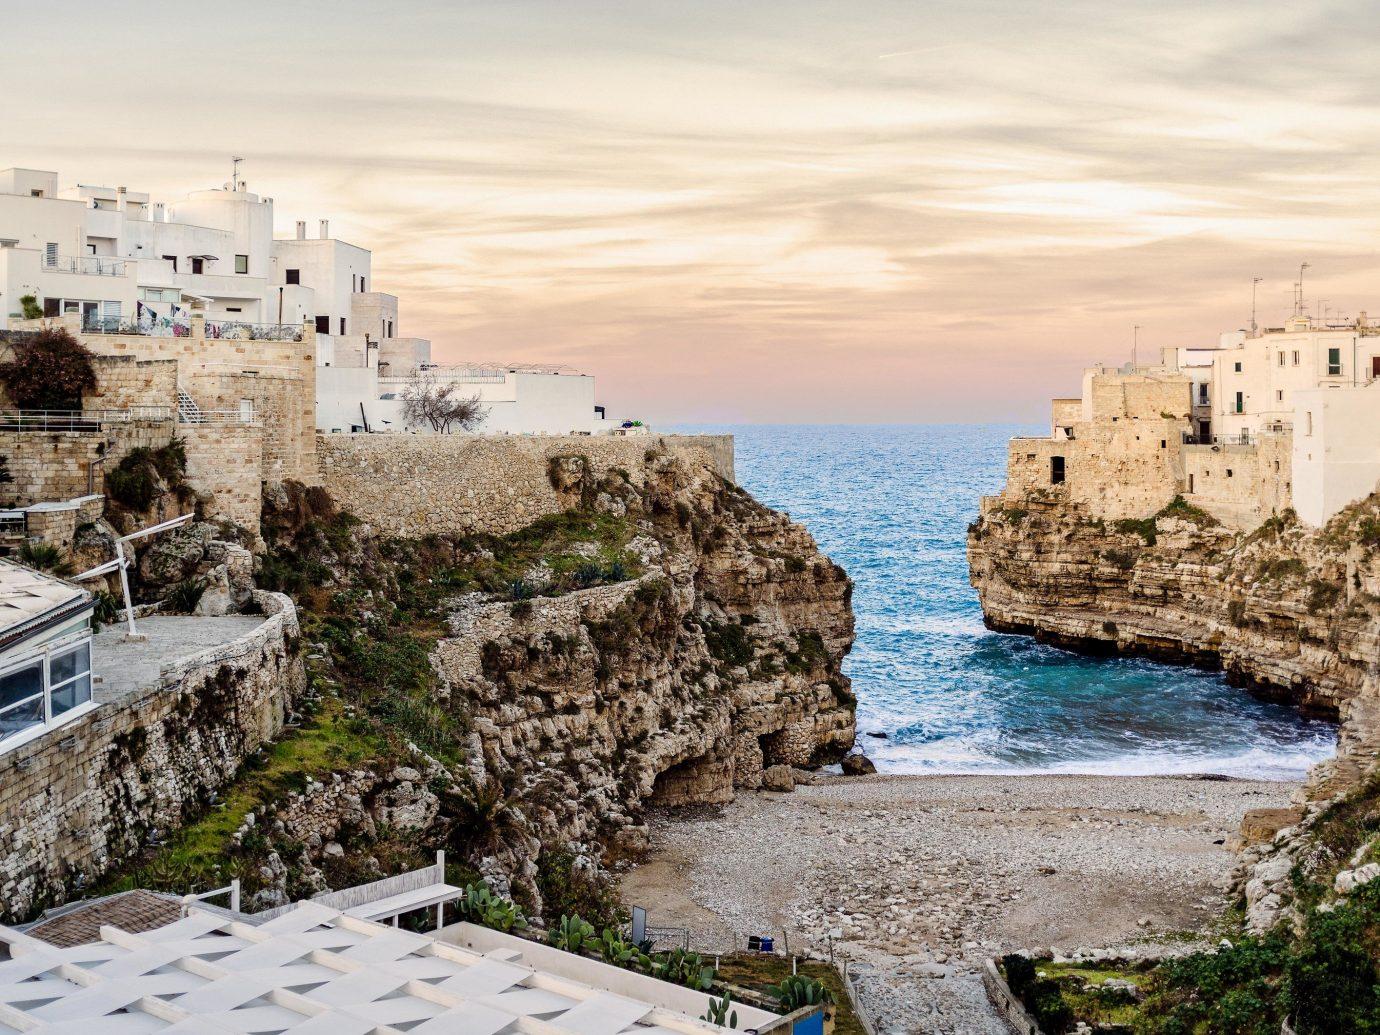 europe Italy Off-the-beaten Path Trip Ideas Sea sky Coast water shore tourism terrain Ocean coastal and oceanic landforms City building cliff rock